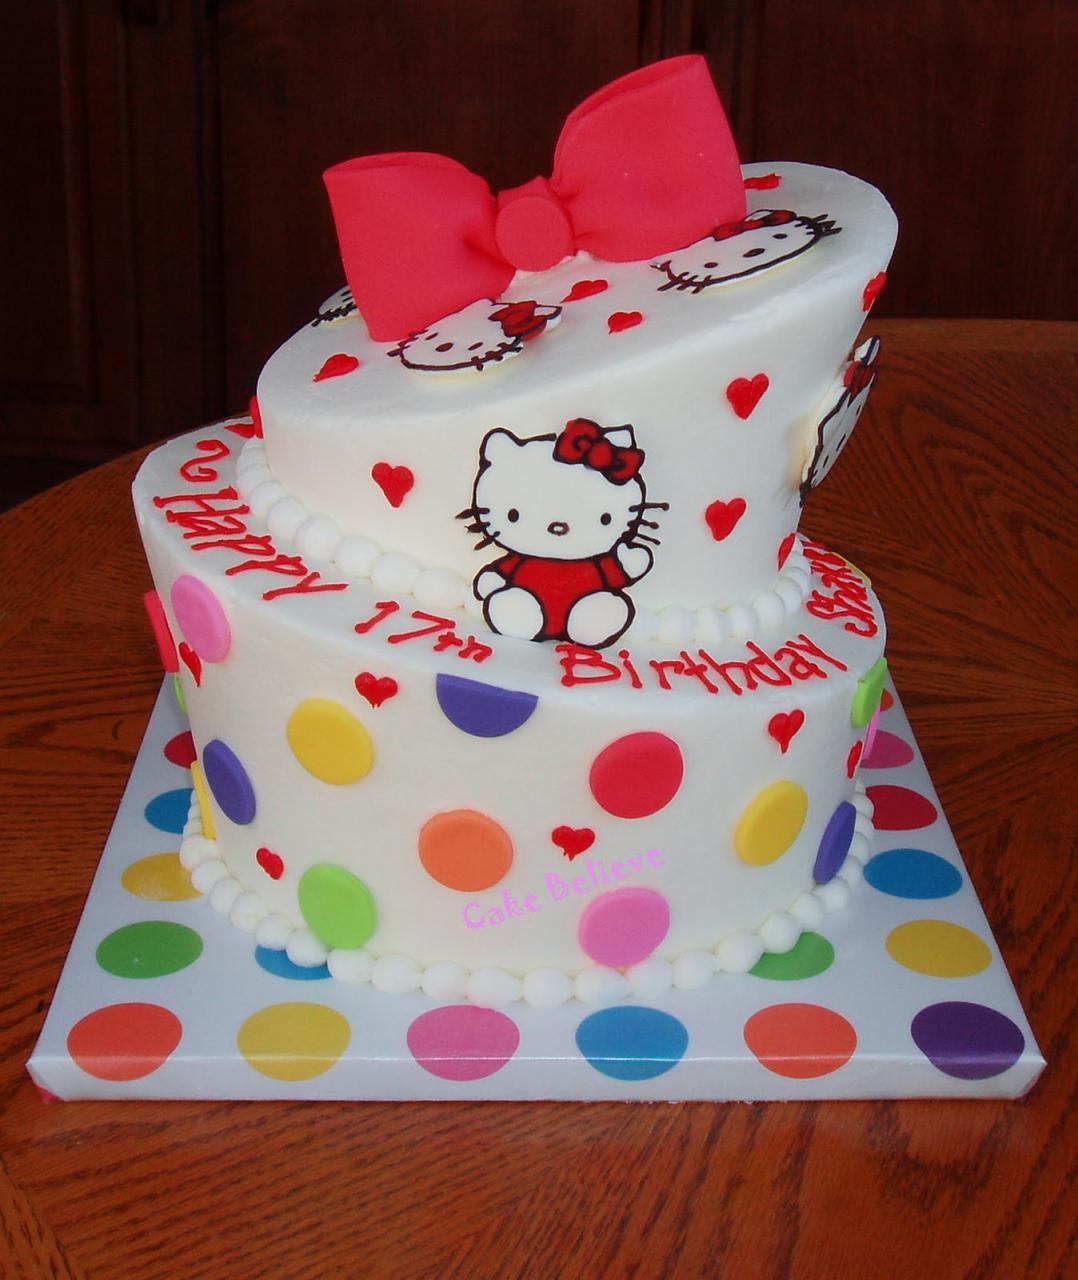 30 Cute Hello Kitty Cake Ideas and Designs - EchoMon